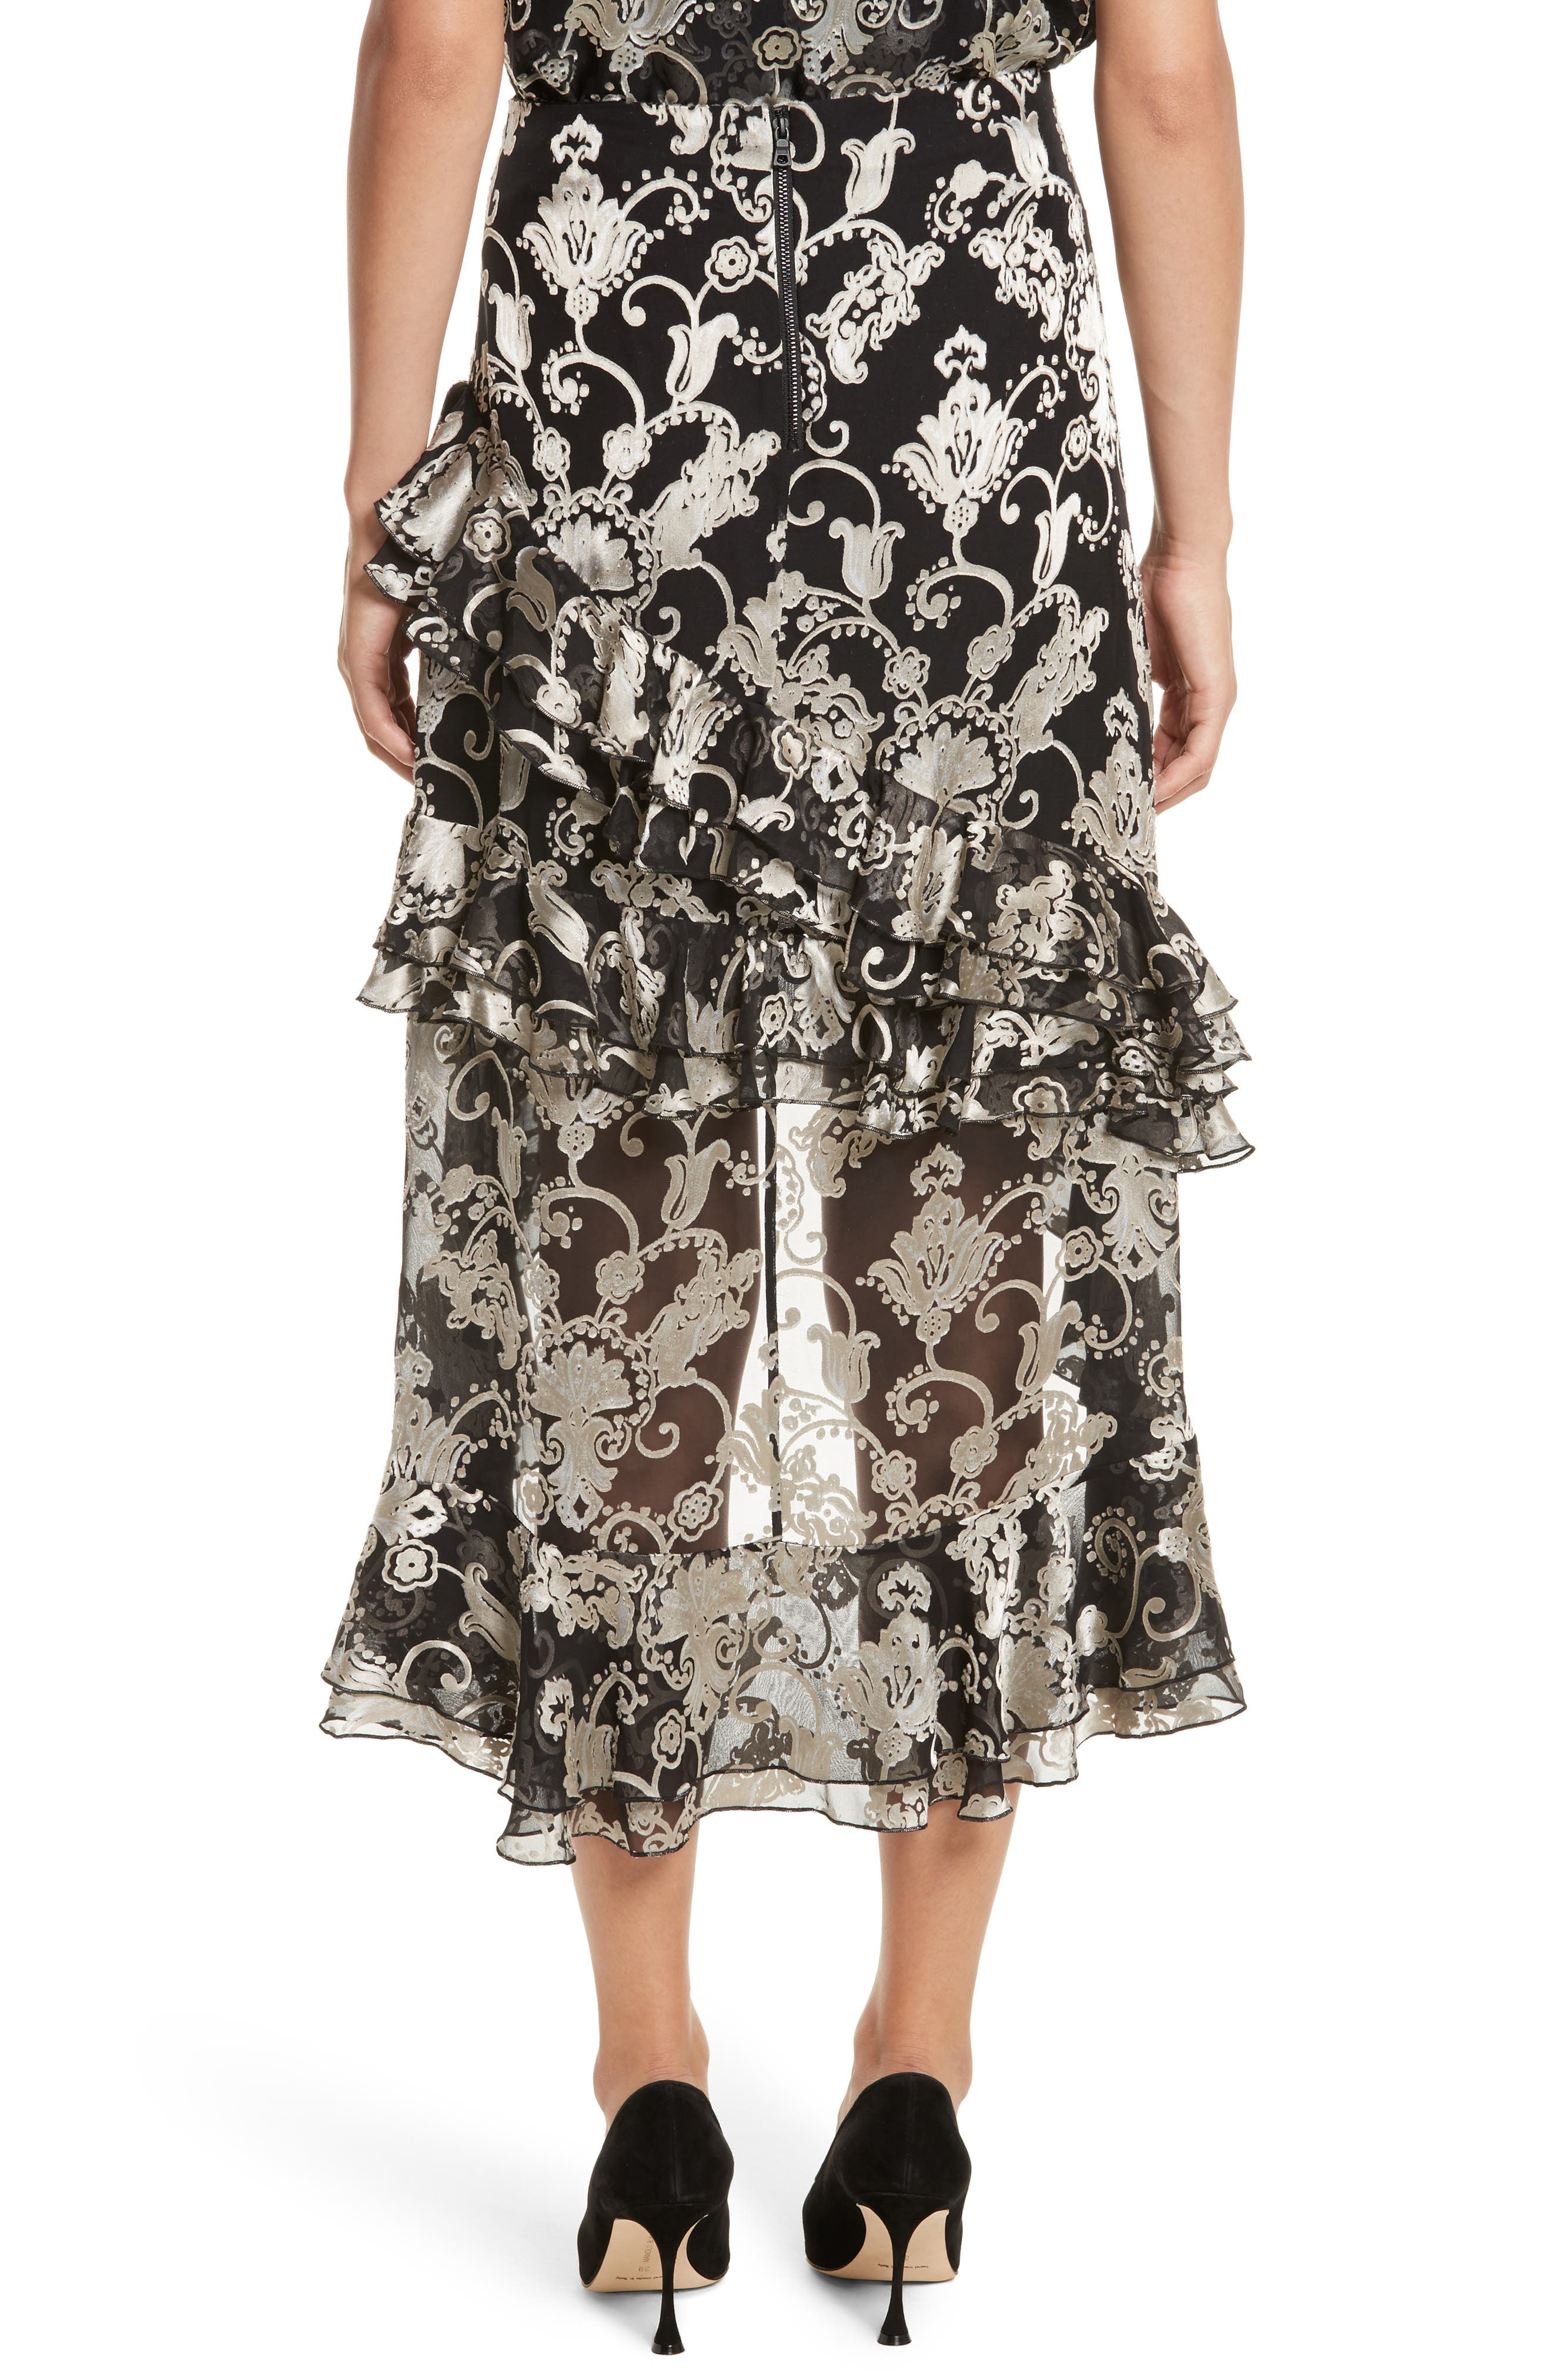 Sasha Asymmetrical Tiered Ruffle Skirt,                             Alternate thumbnail 3, color,                             Black/ White